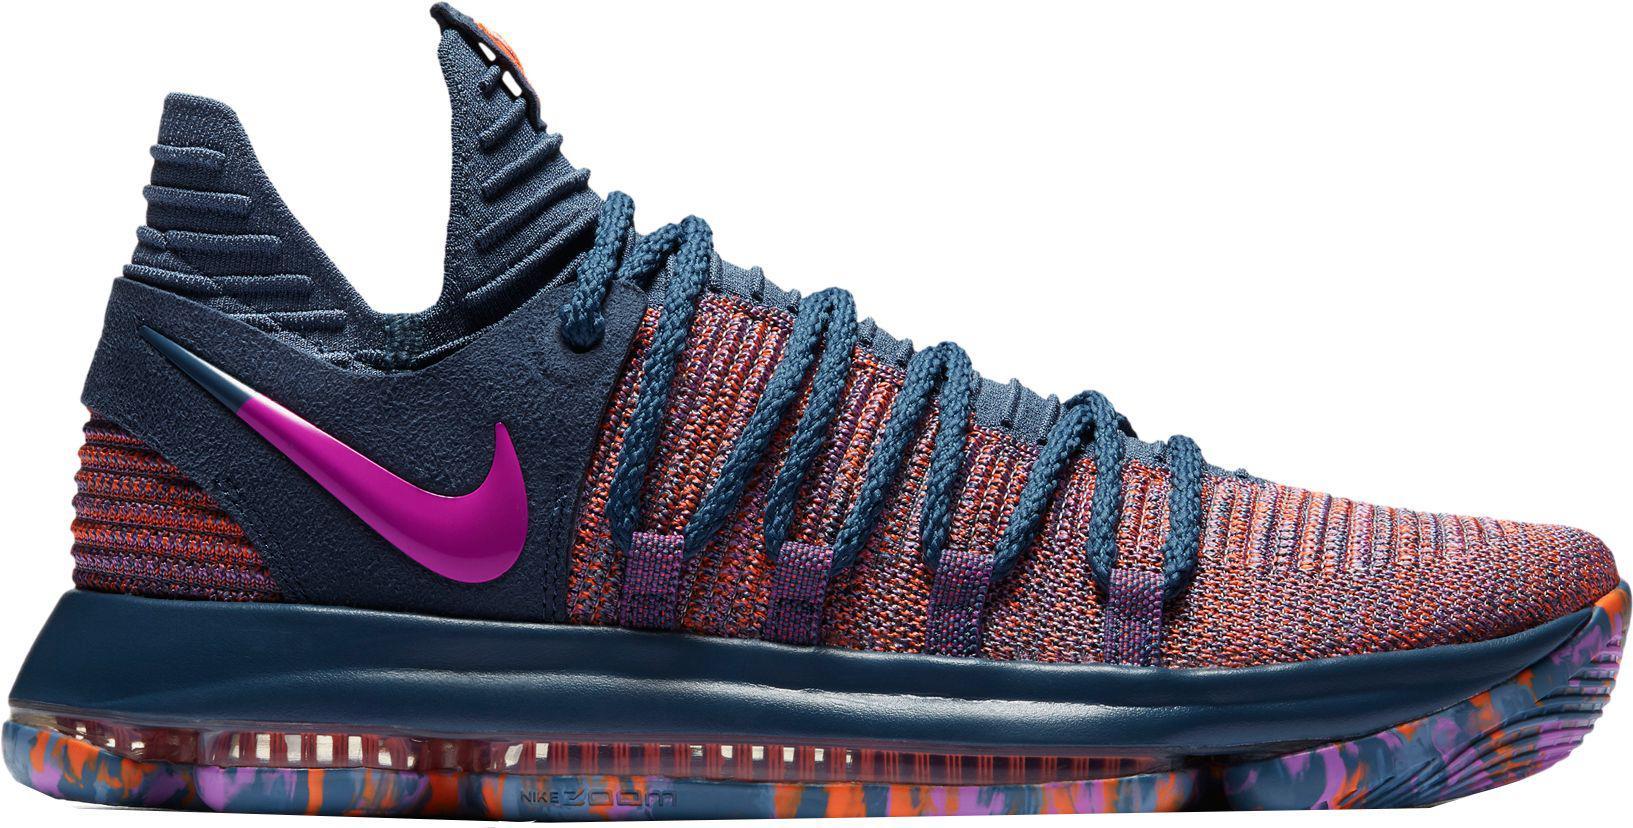 adb7e090ffe9 ... official store nike blue zoom kd 10 lmtd basketball shoes for men lyst  f2f83 4b8ea